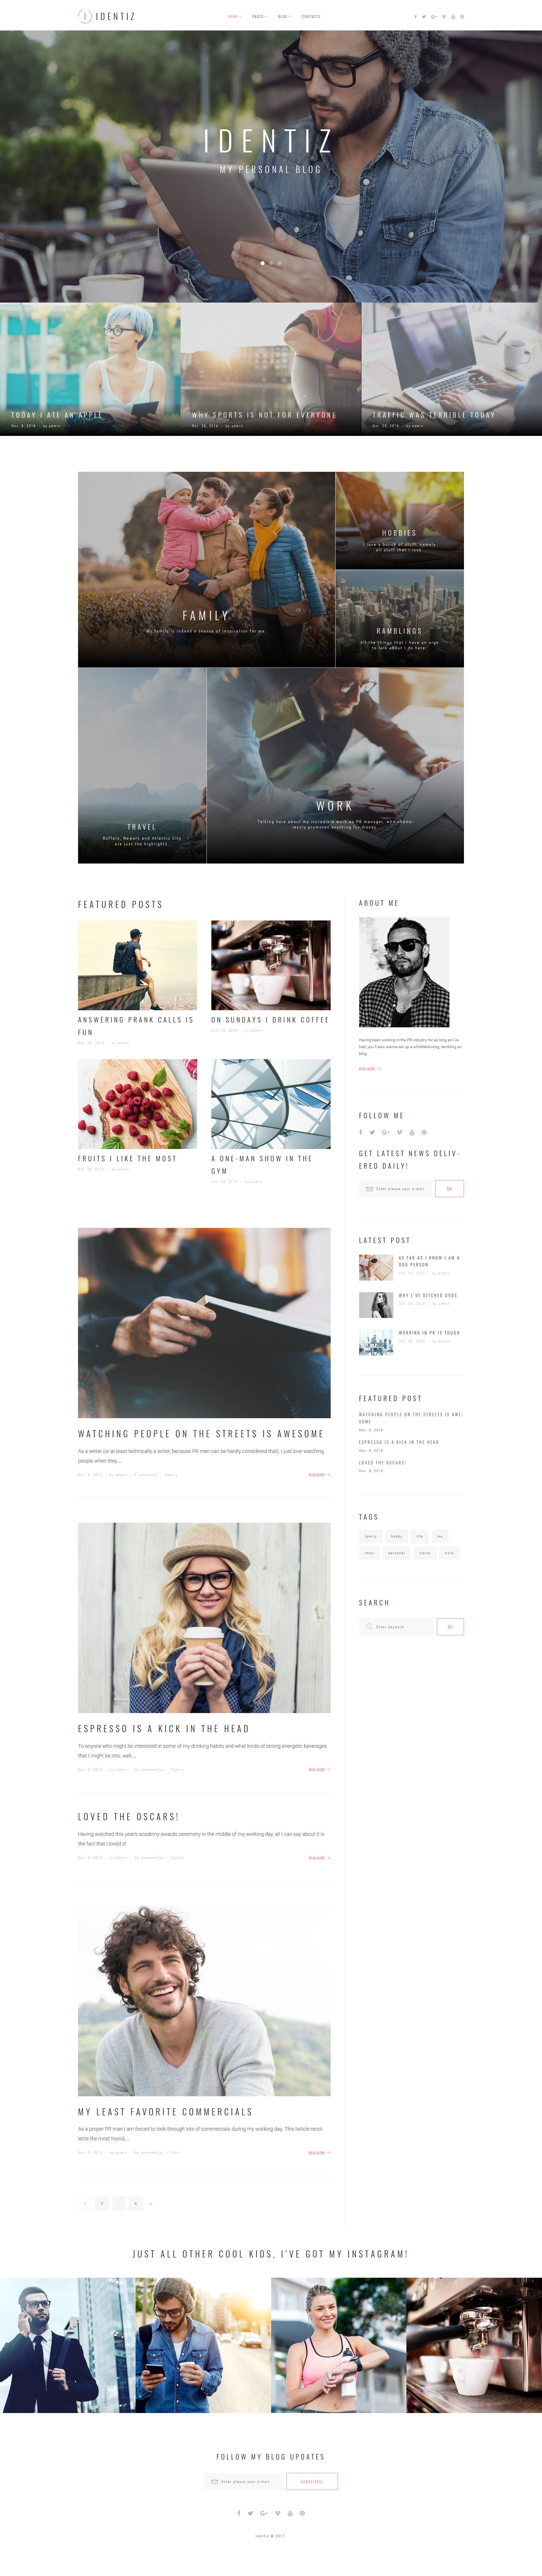 Responsive Identiz - Personal Blog Wordpress #63592 - Ekran resmi